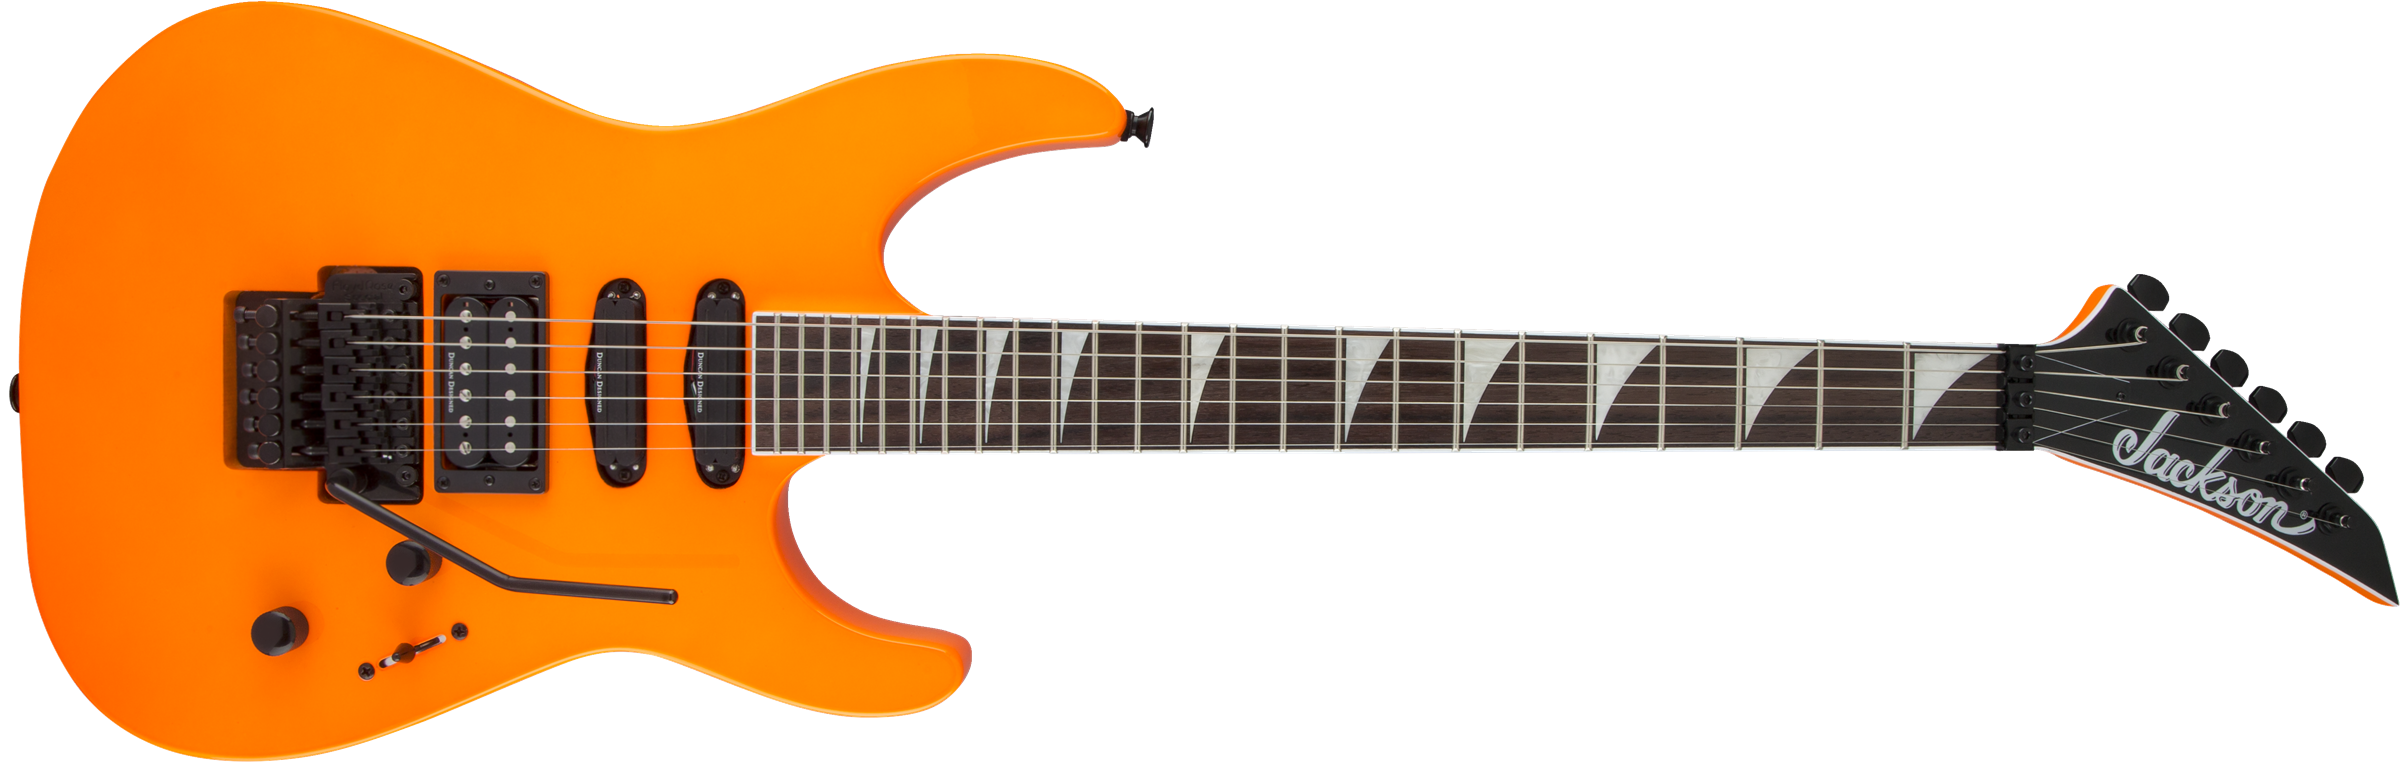 JACKSON X Series Soloist SL3X, Rosewood Fingerboard, Neon Orange